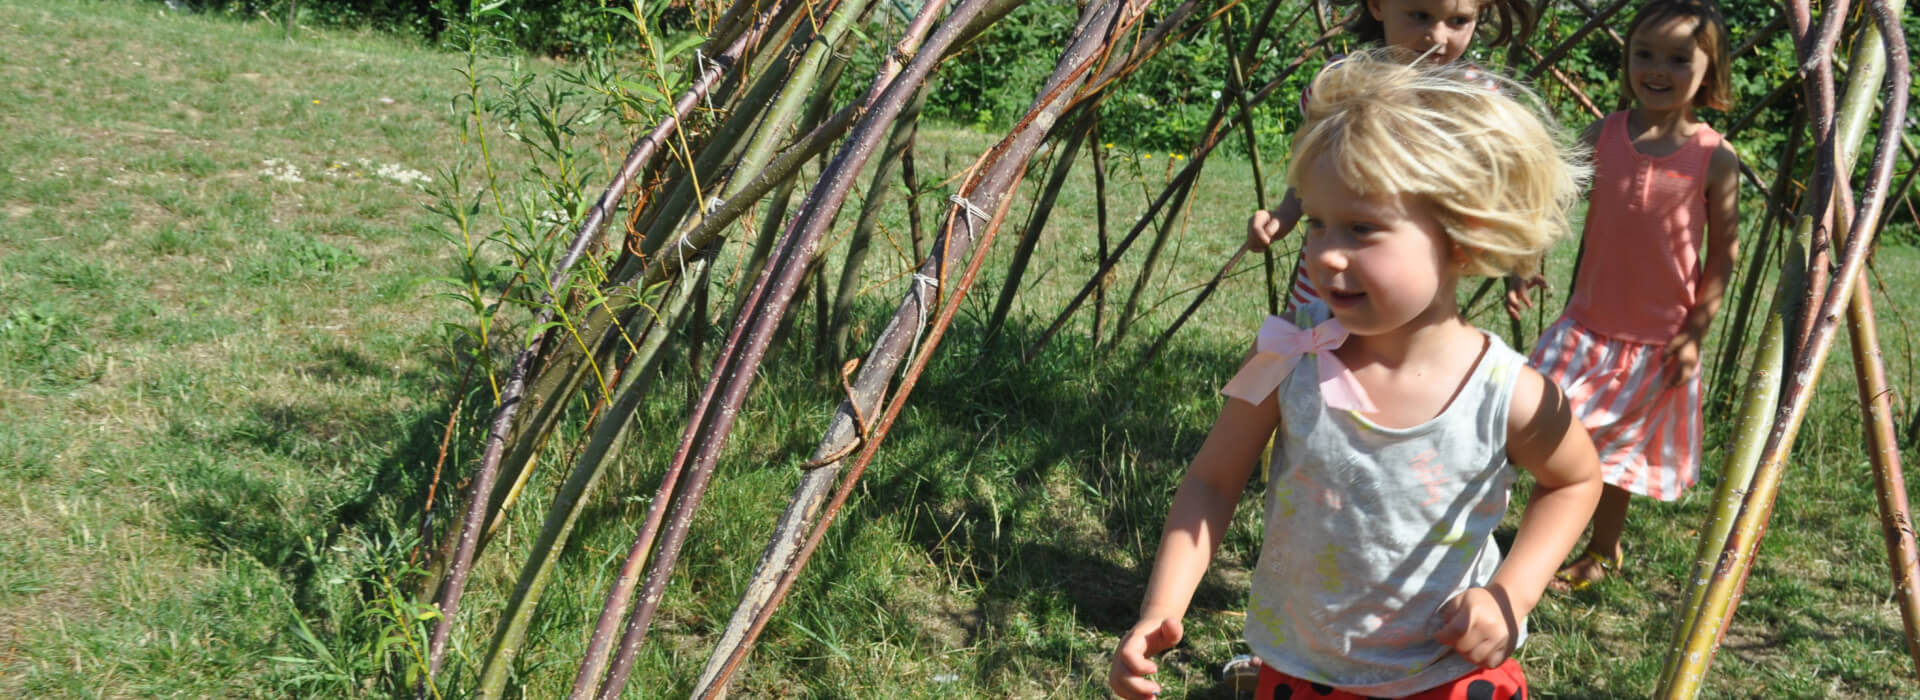 Basischool De Kleine Okapi